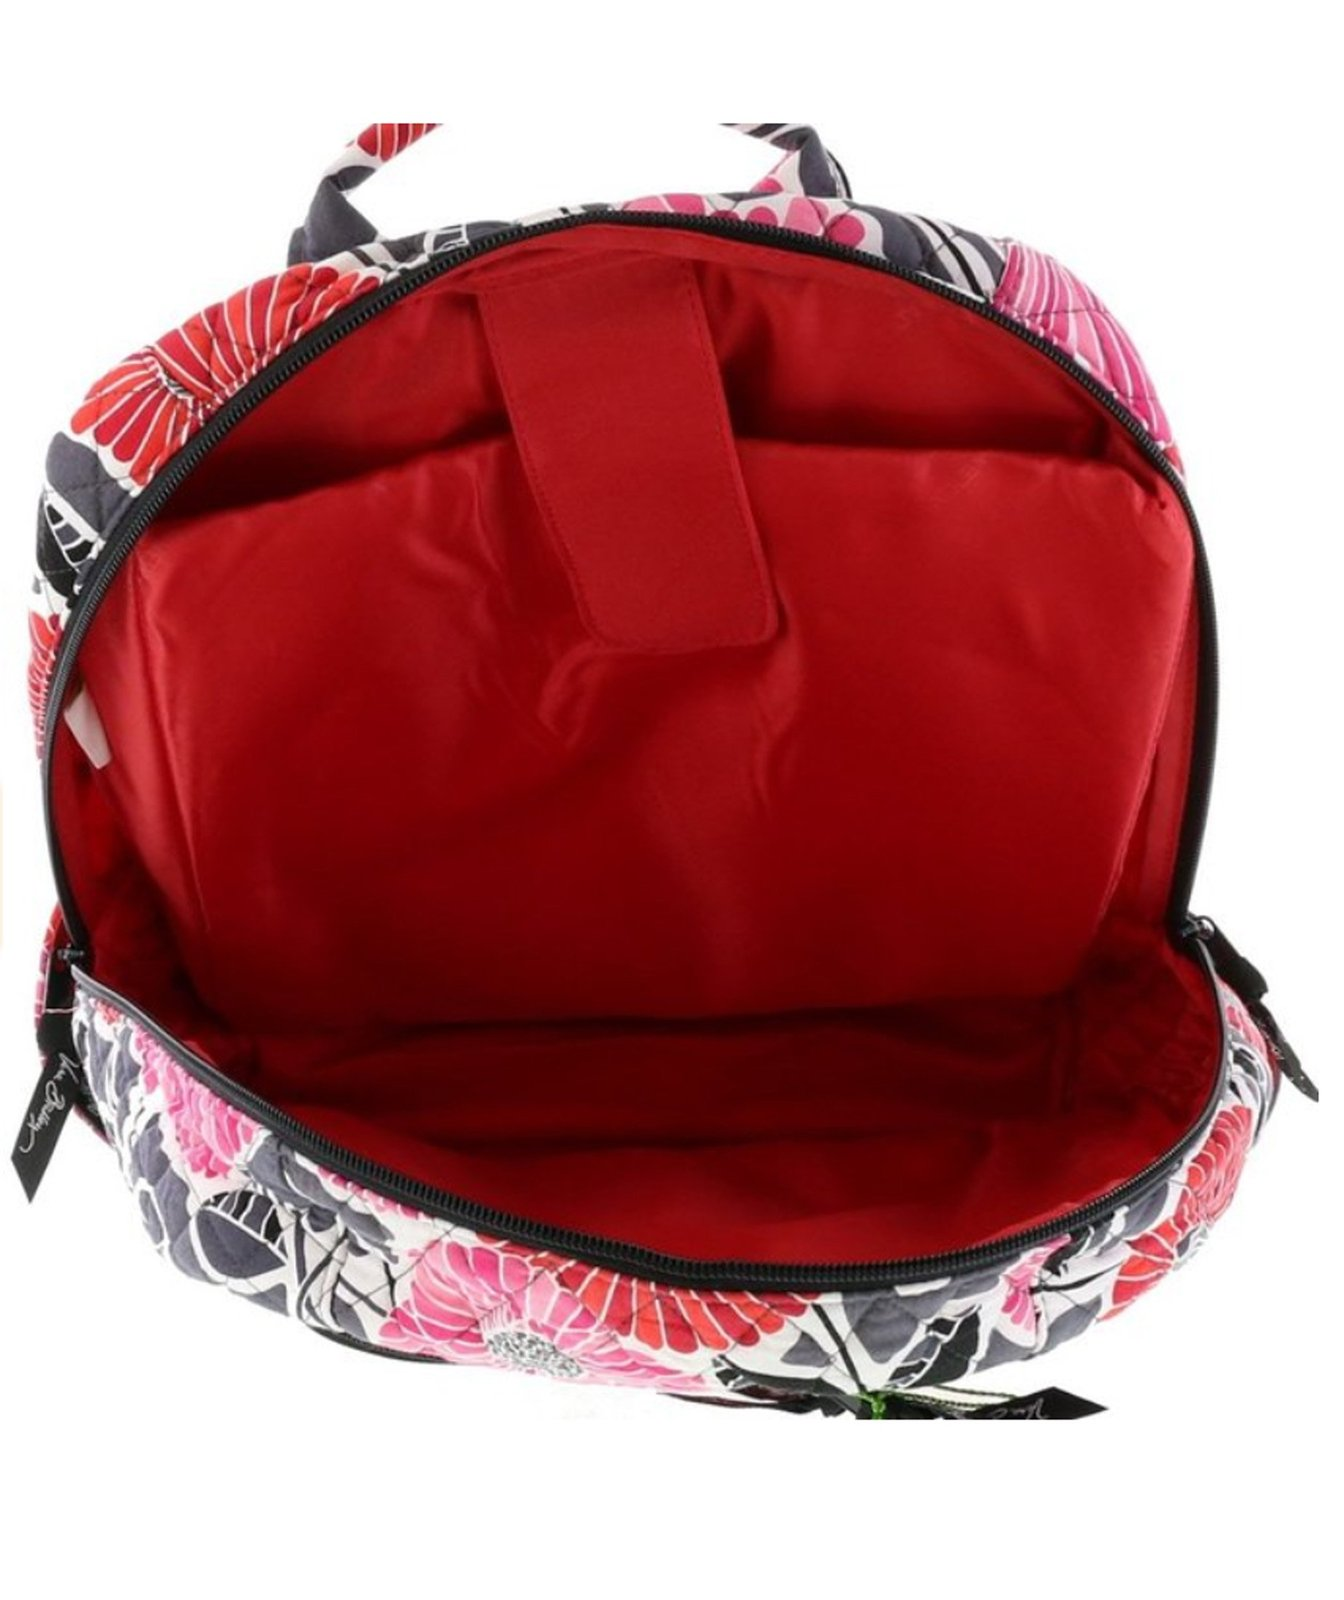 Vera Bradley Laptop Backpack Computer School Bookbag in Cheery Blossoms